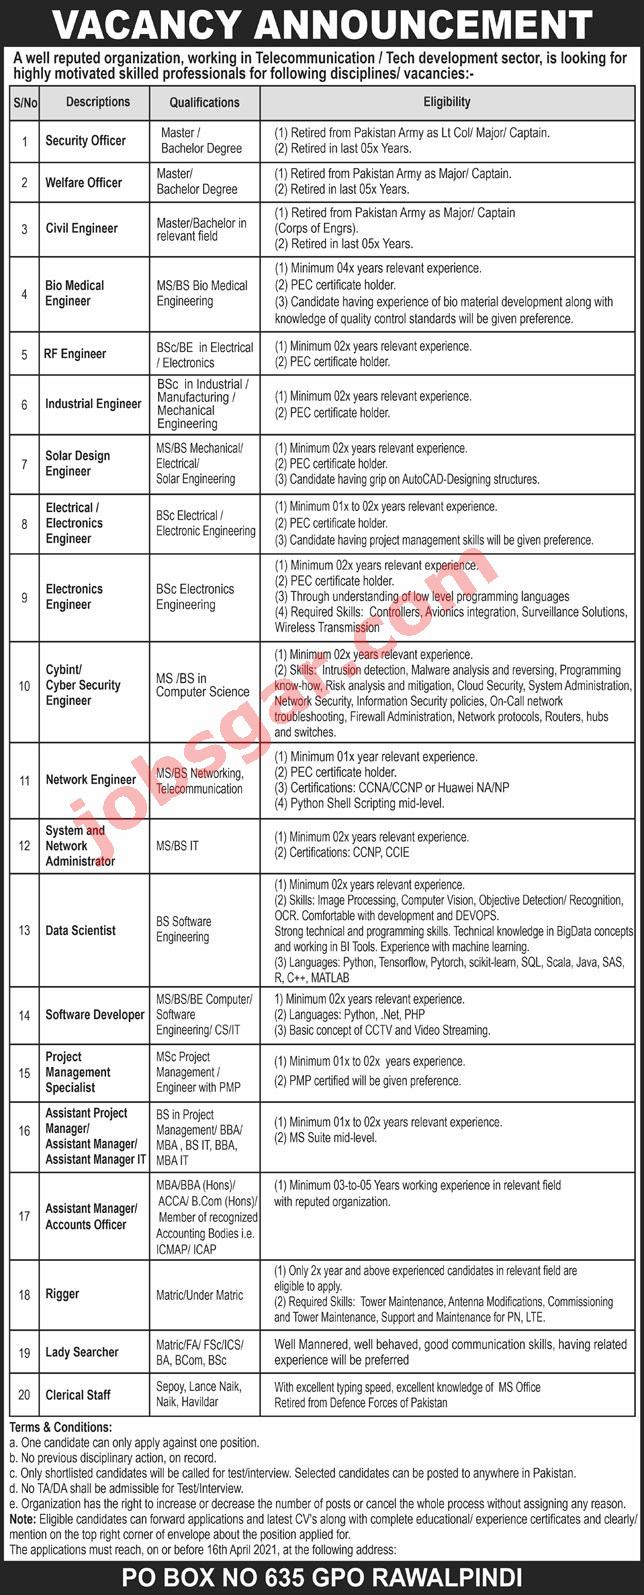 Public Sector Organization PO Box 635 Rawalpindi Jobs 2021